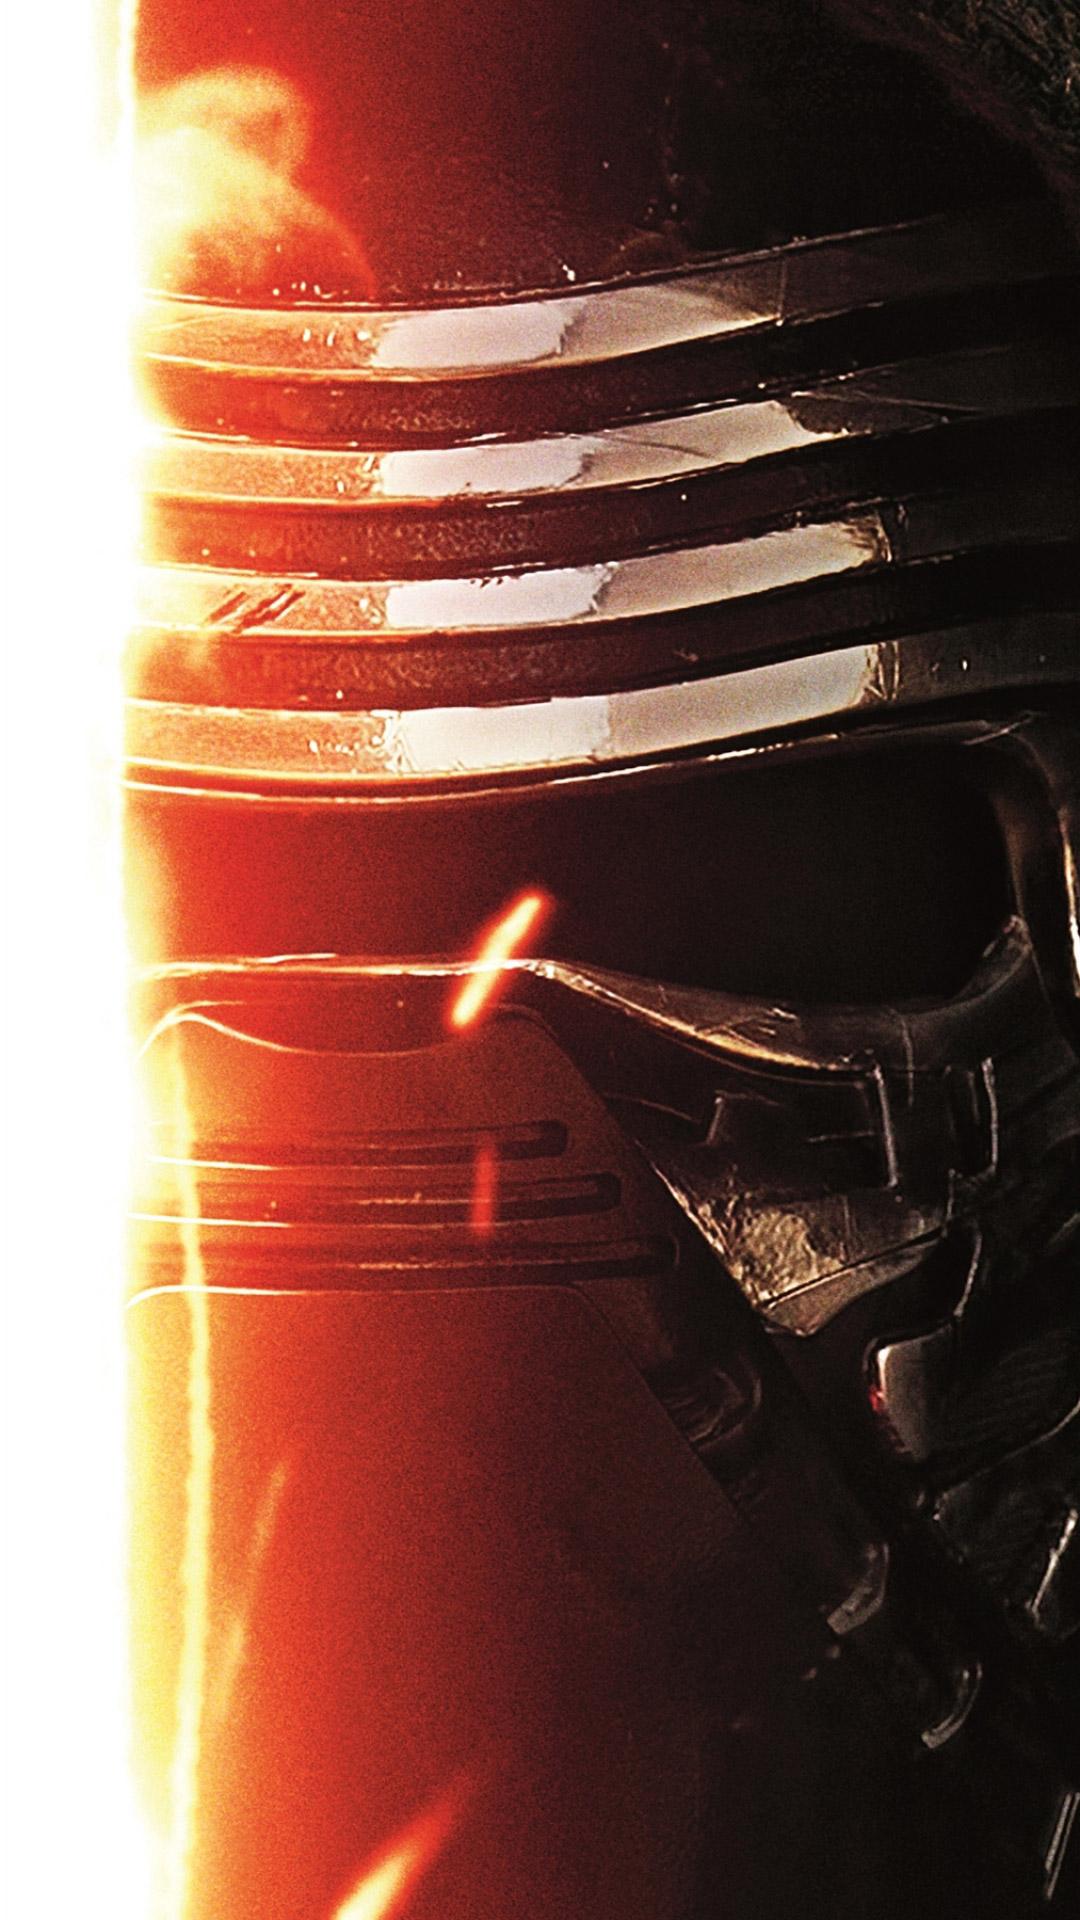 Star-Wars-The-Force-Awakens-Wallpaper-Kylo-Ren-Lightsaber